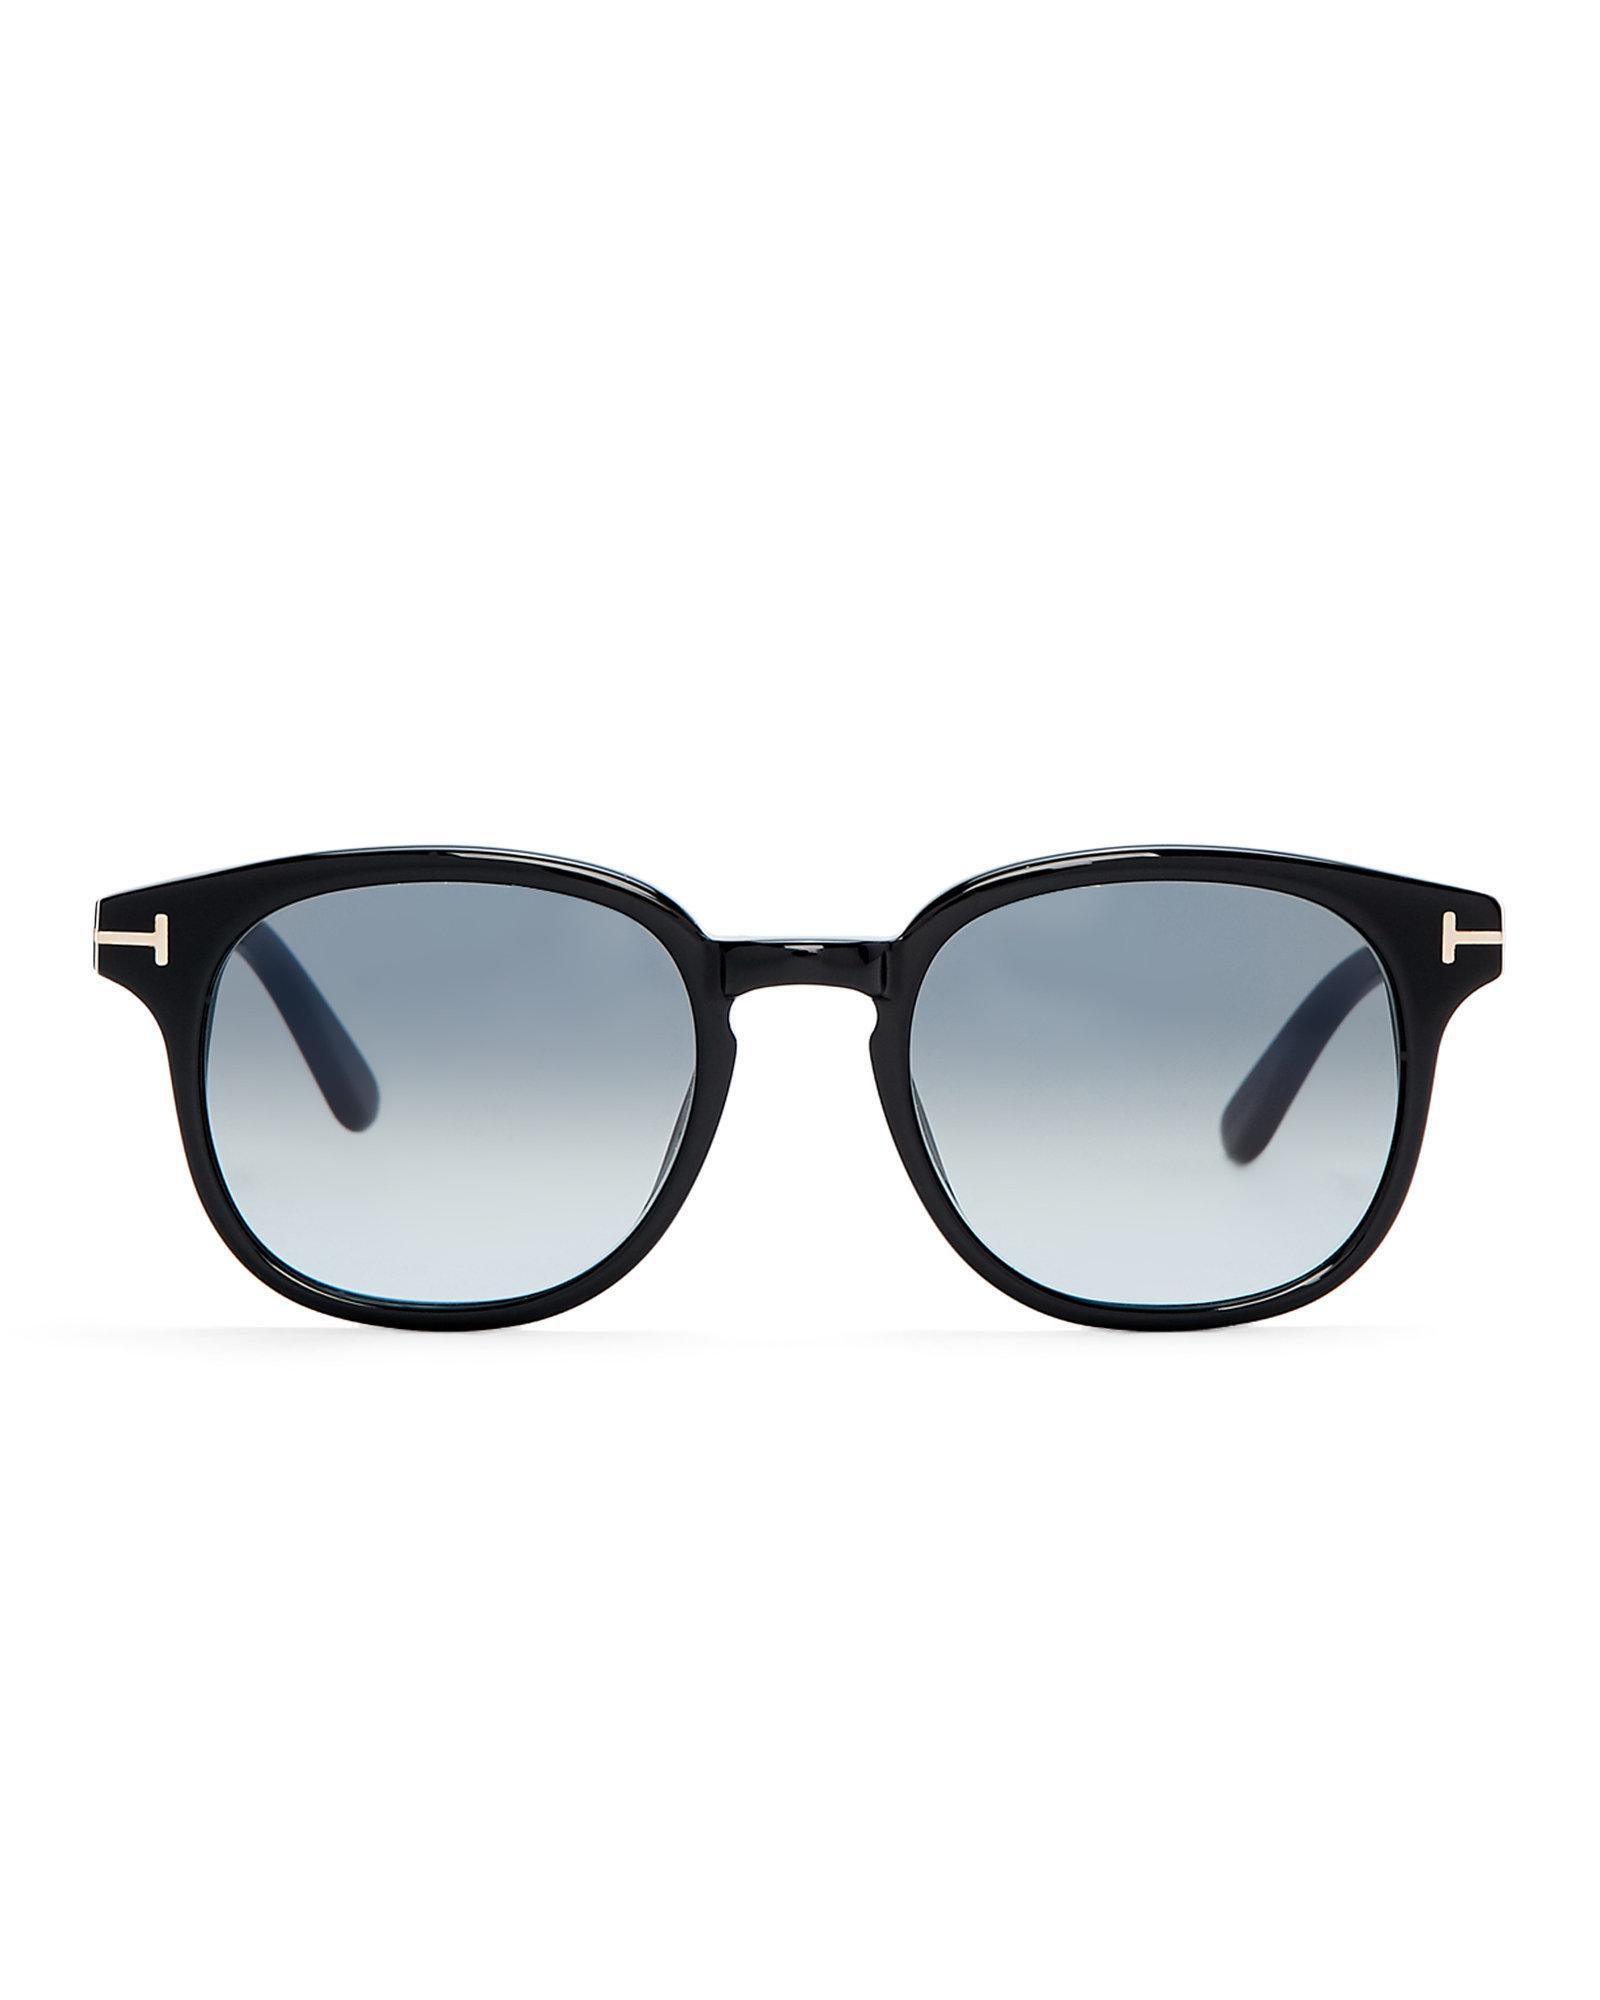 a7e2f210b67cd Tom Ford Tf399 Black Frank Square Sunglasses in Black - Lyst